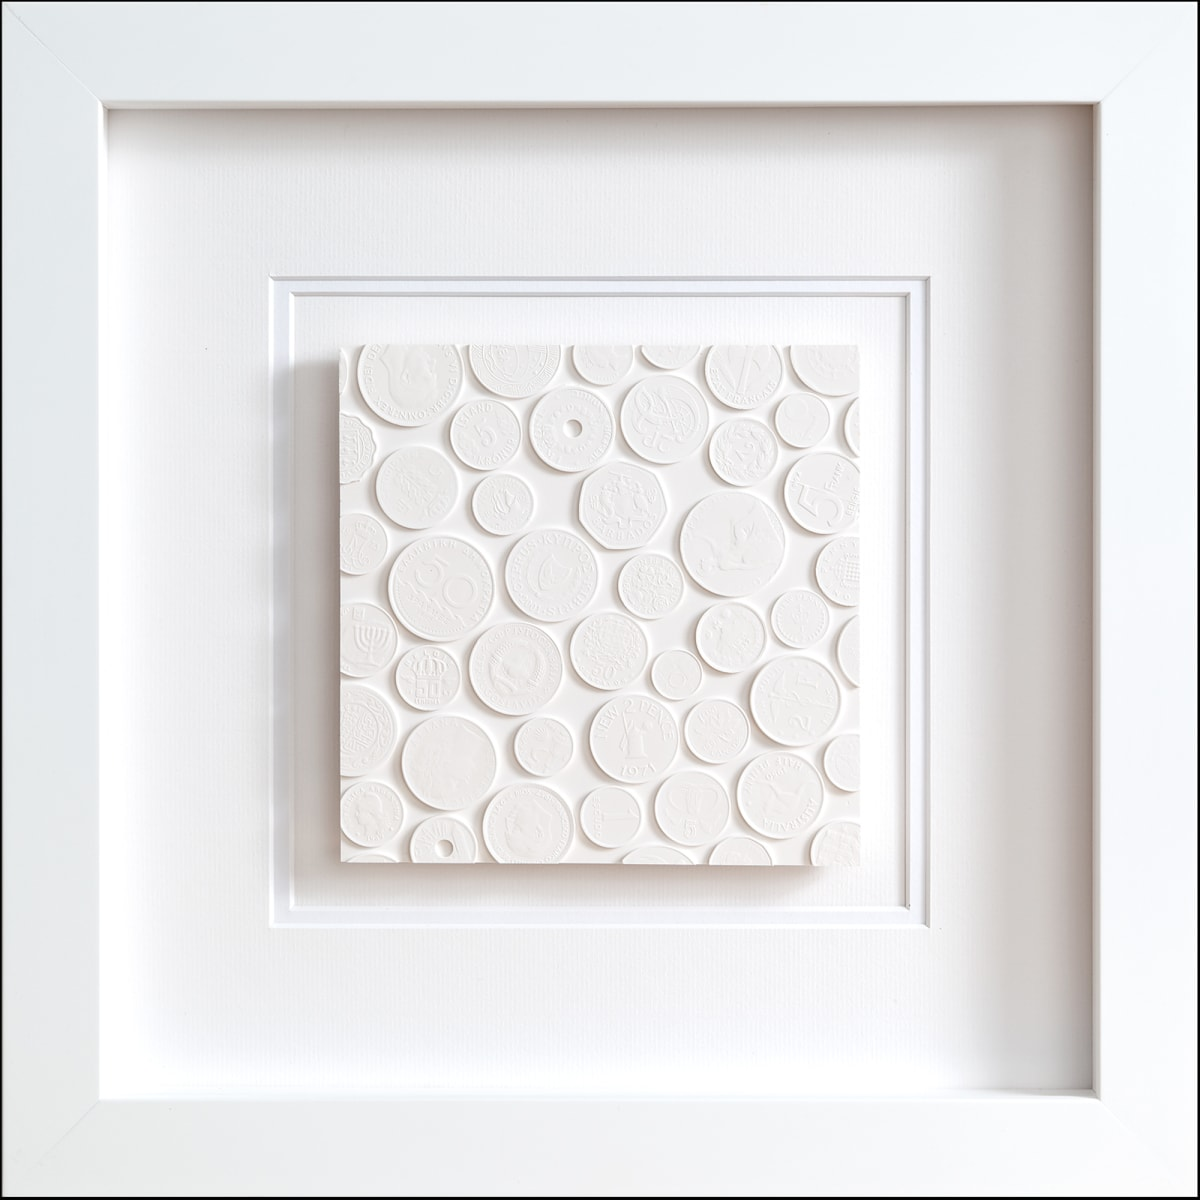 Tom Martin Single Tile Plaster behind perspex 35 x 35 cm (Framed) Edition of 10